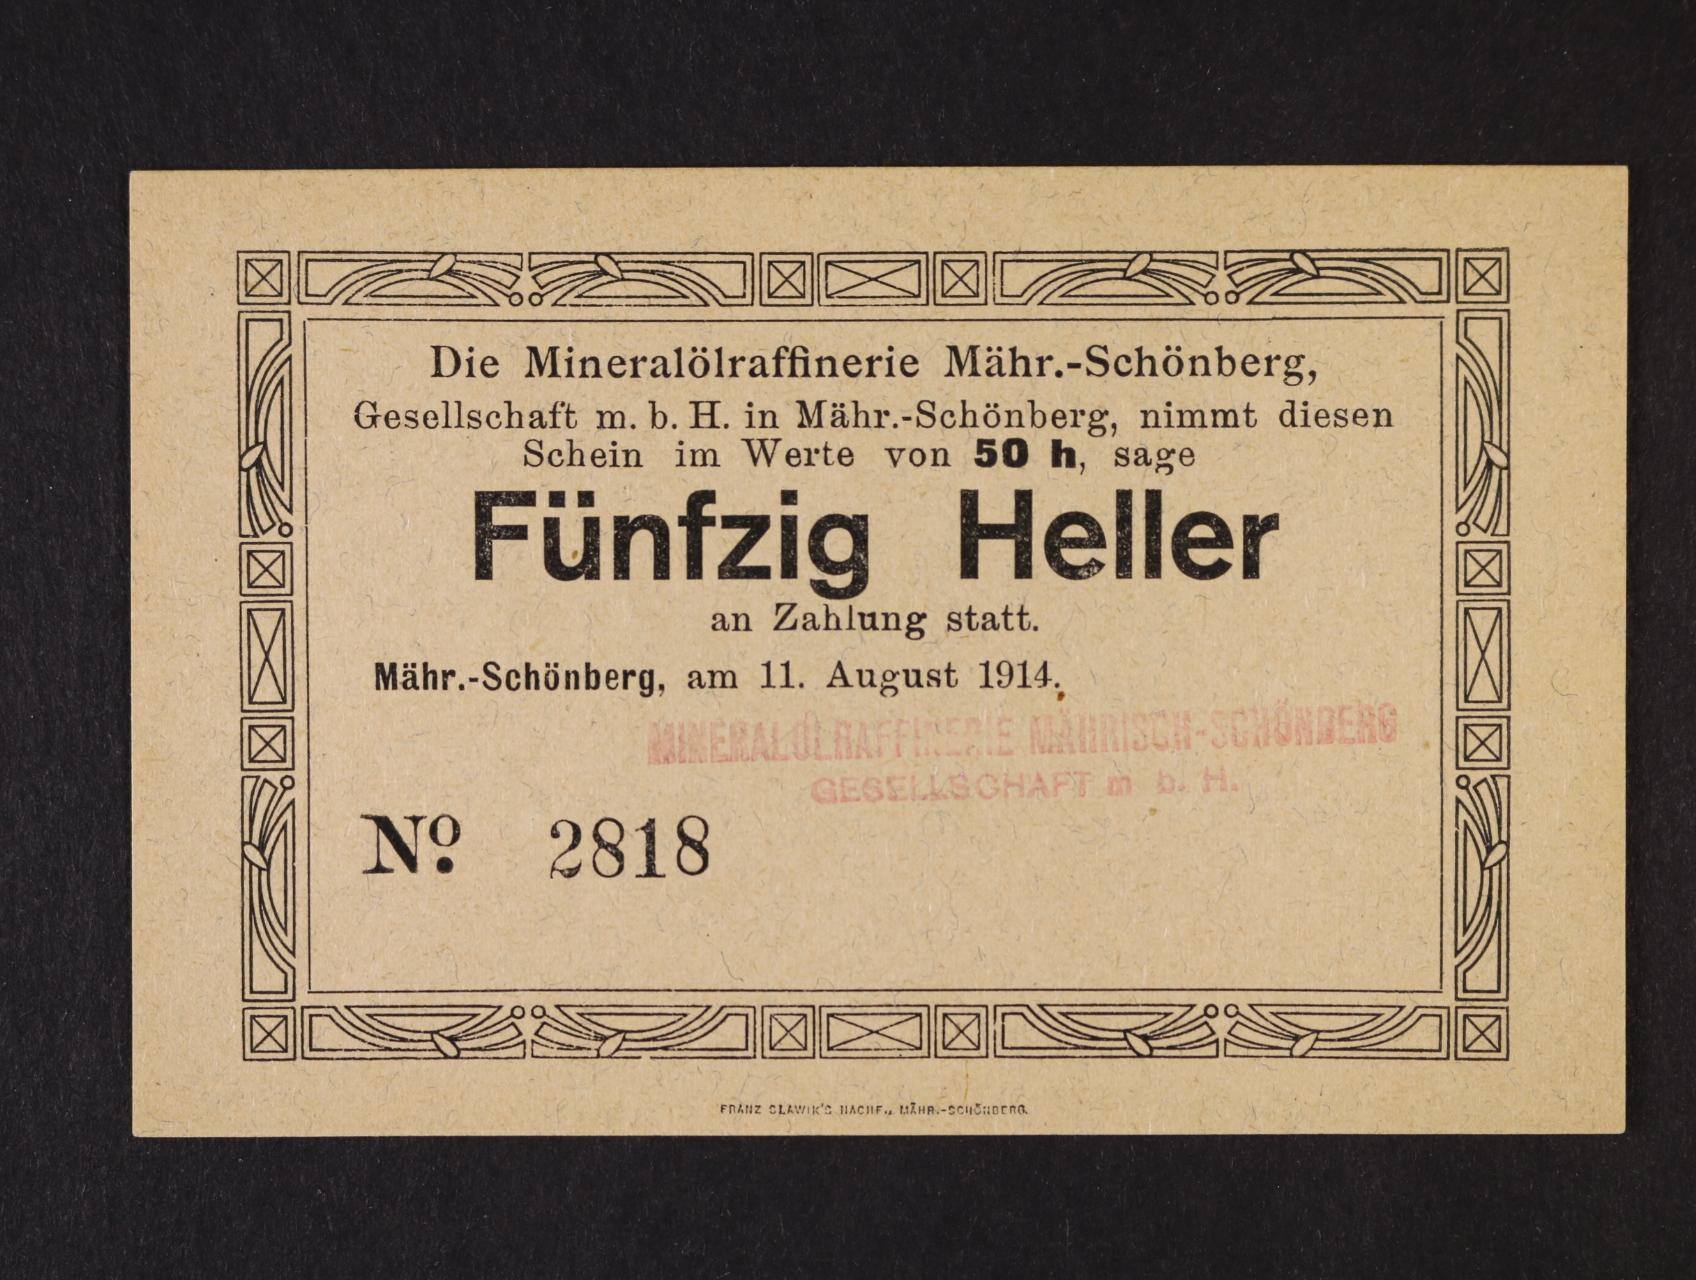 Mährich Schönberg (Šumperk), 50 h 11.8.1914 Mineralölraffinerie G.m.b.H, D.H. 120.2.1a.v